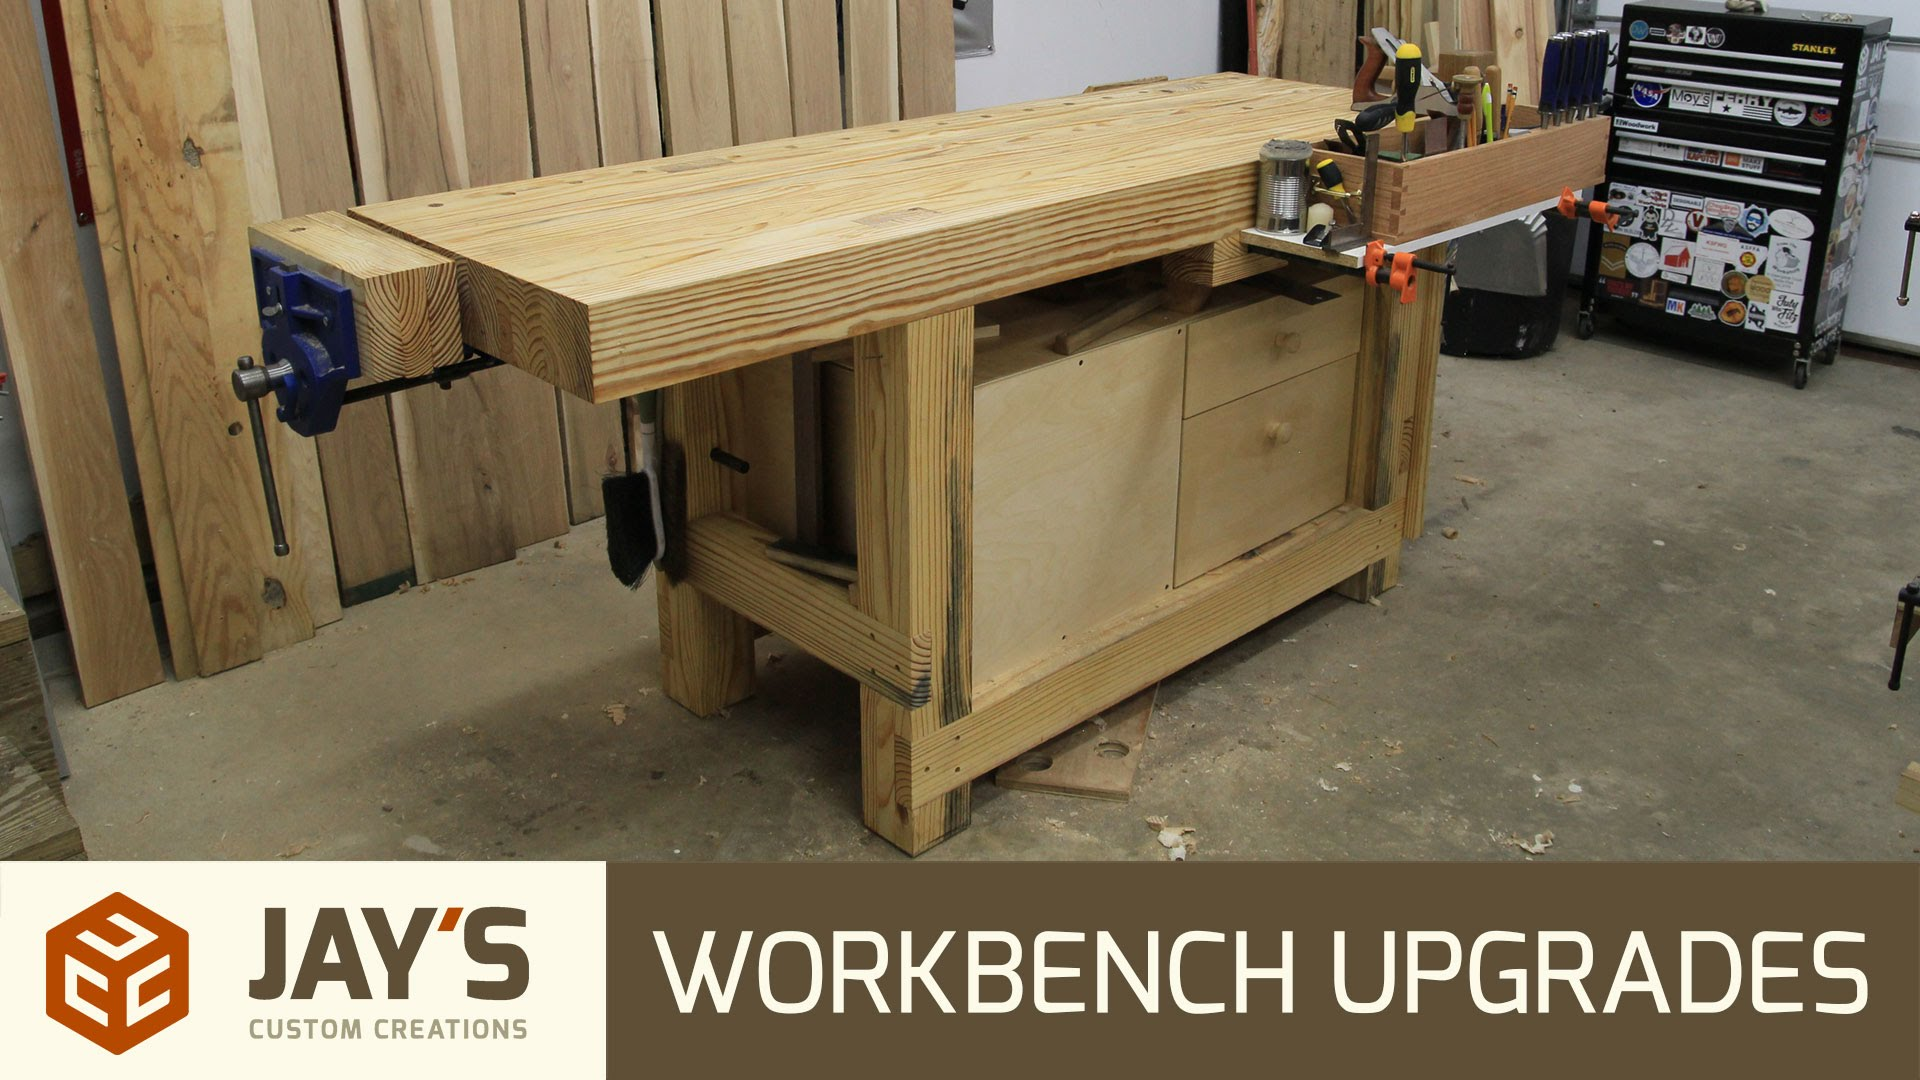 Workbench Upgrades Jays Custom Creations